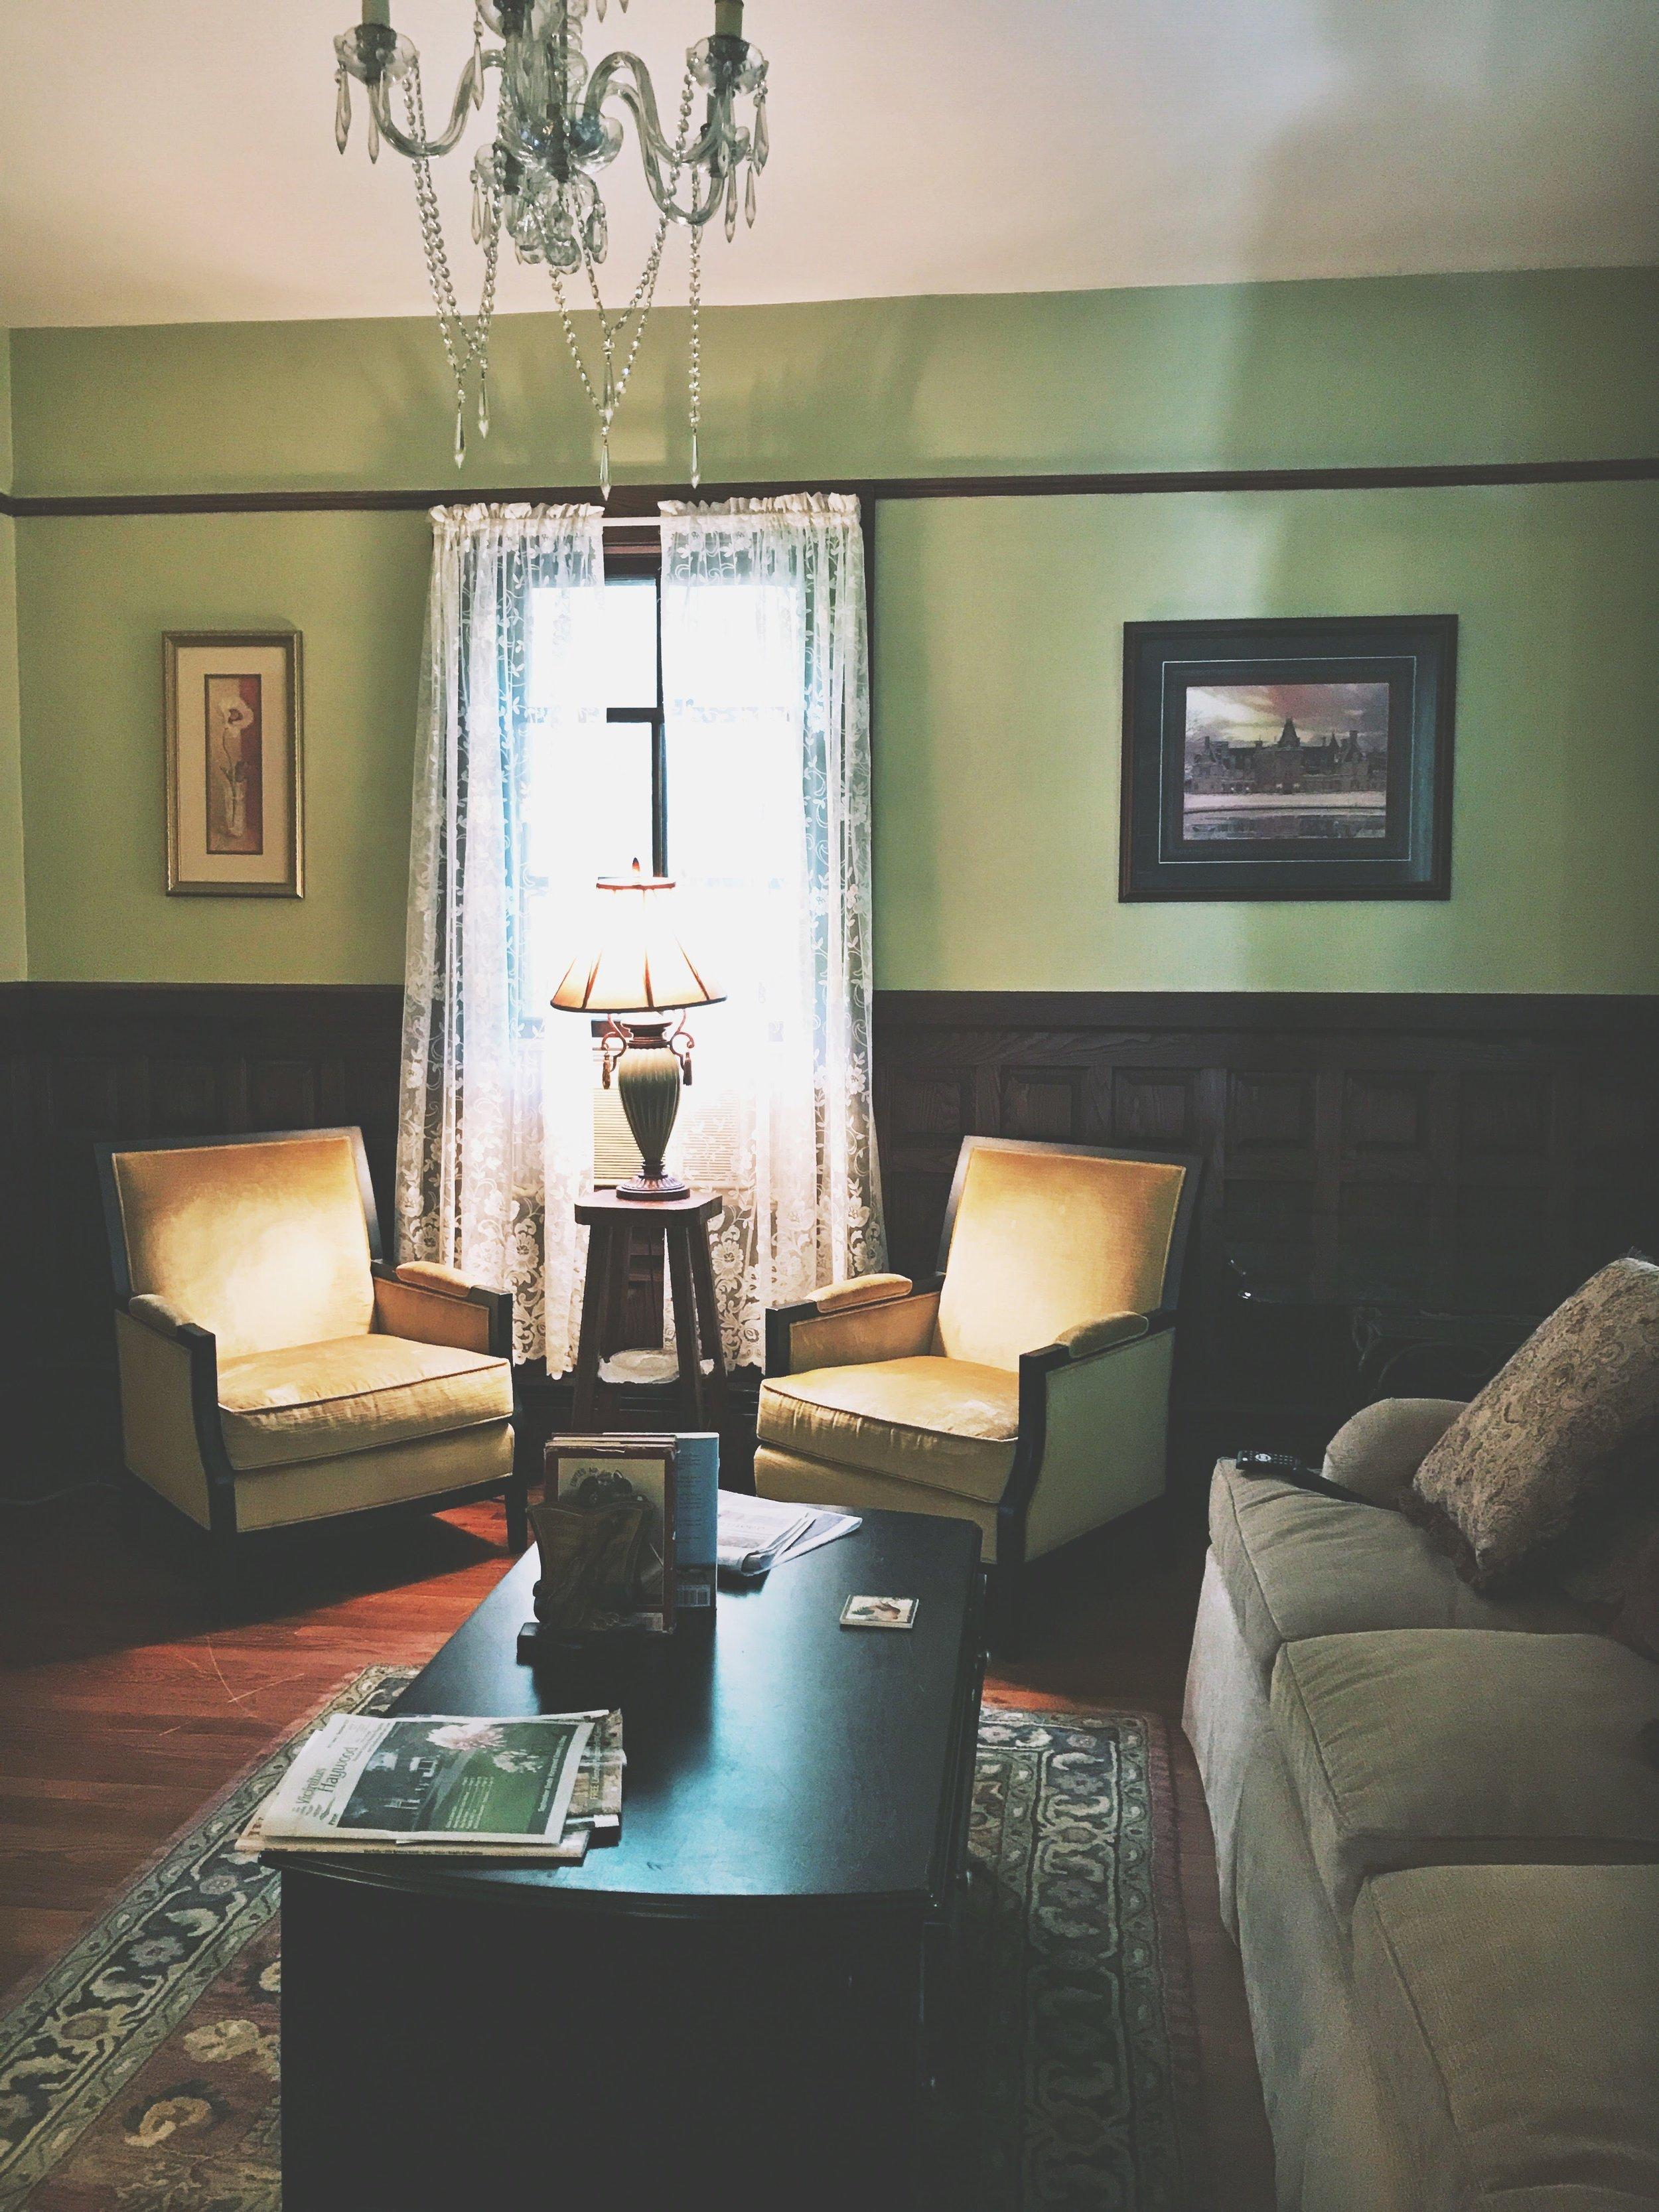 Common/living room